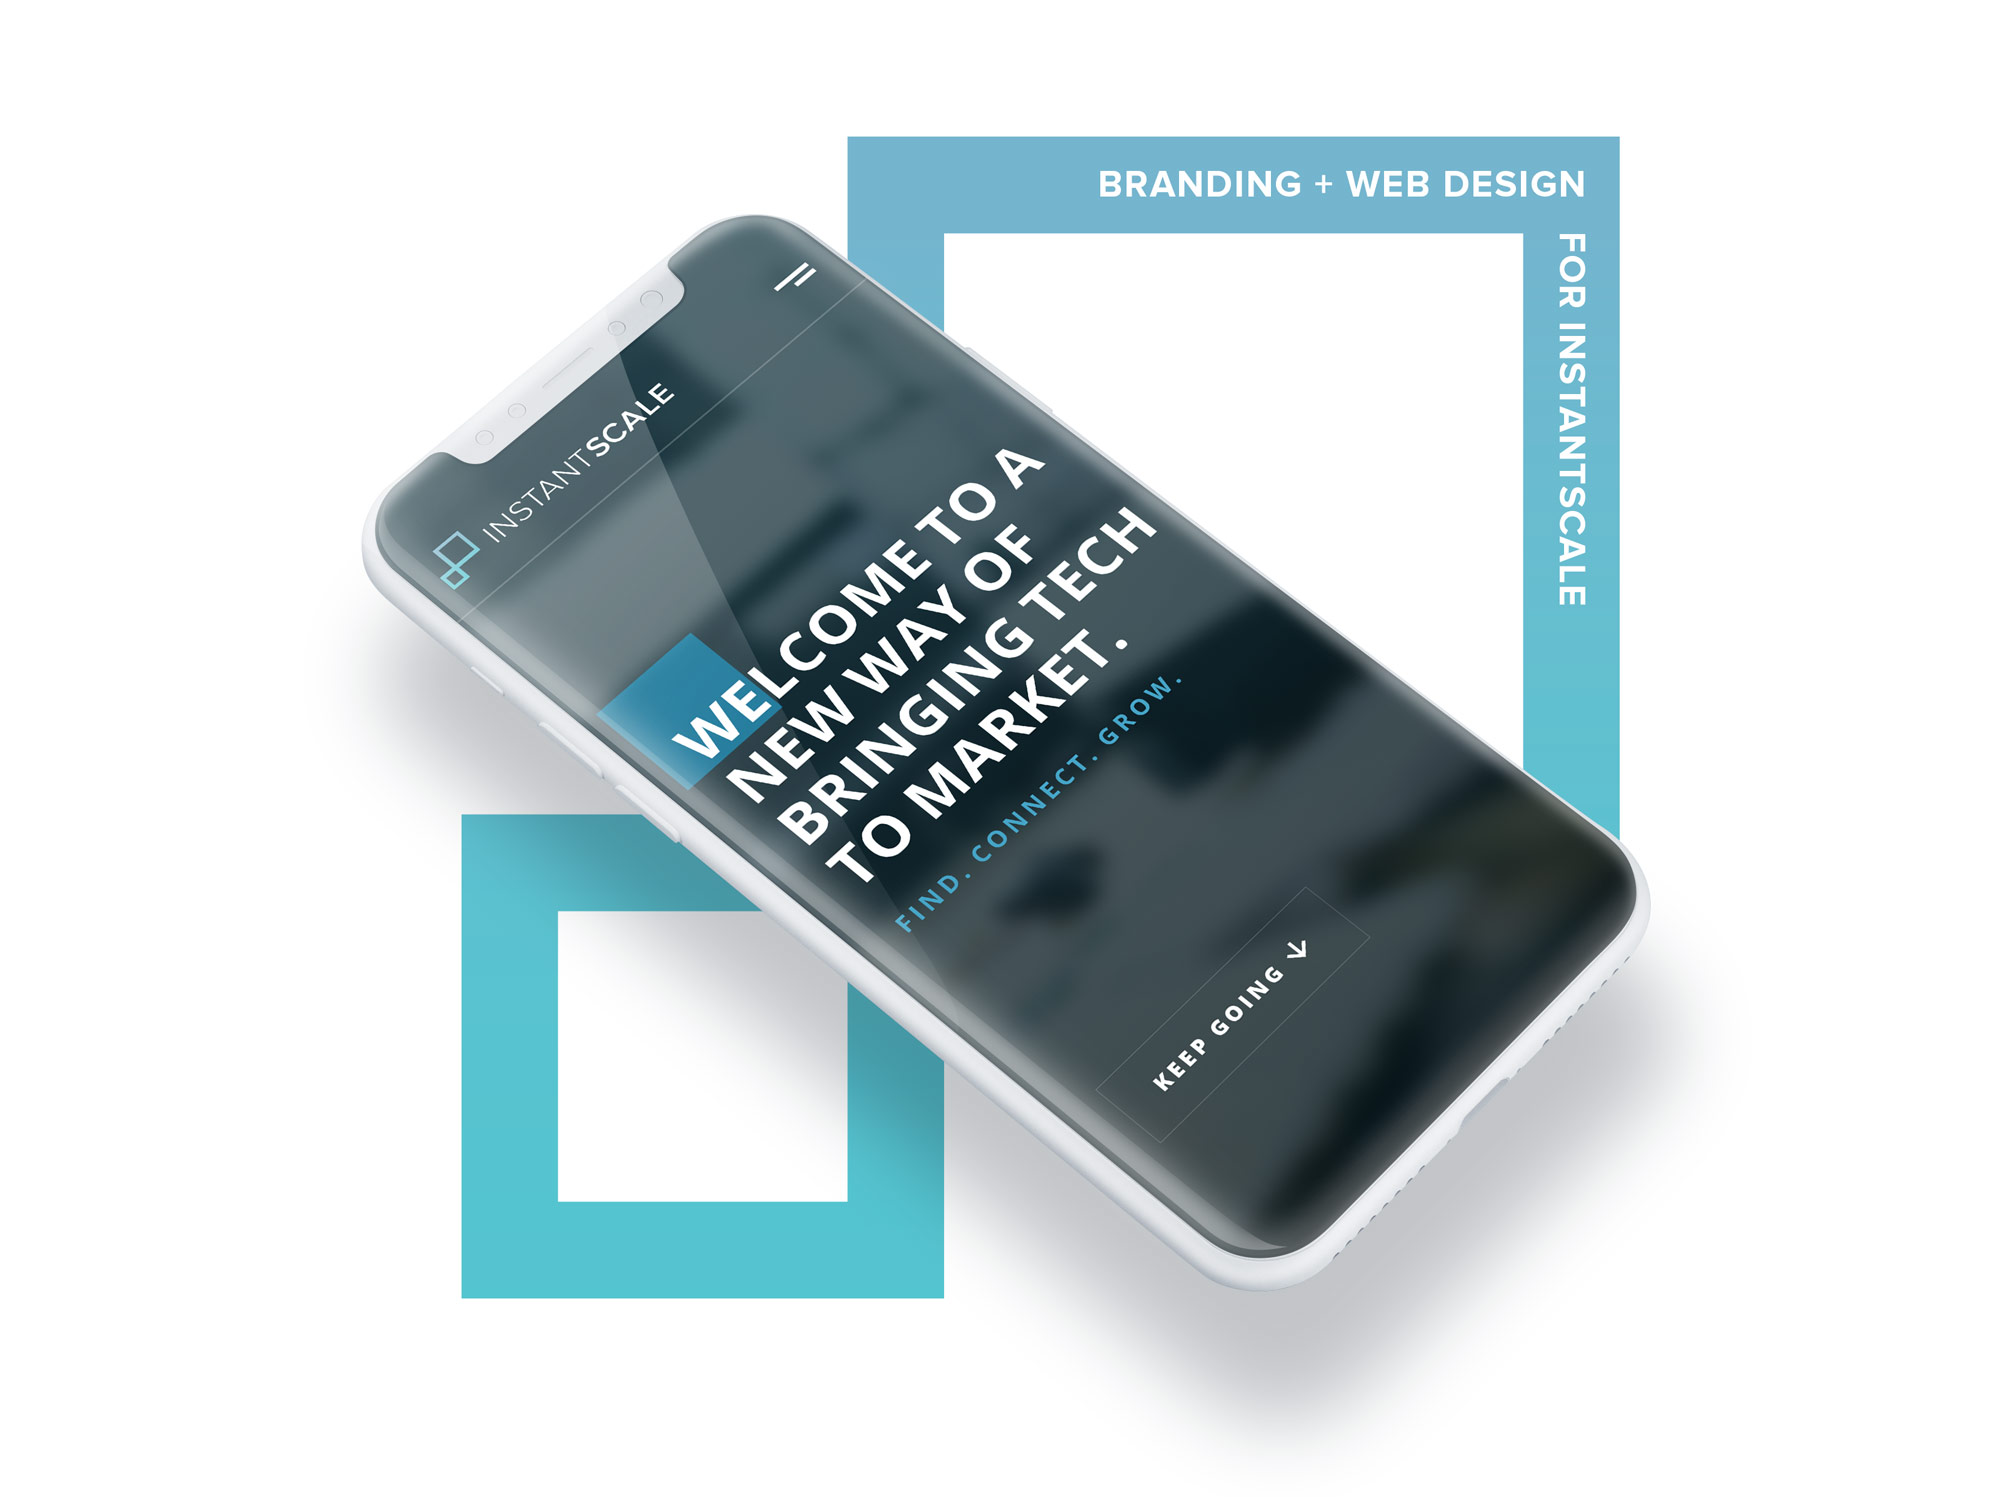 instantscale-iphone-x-mockup-w-title